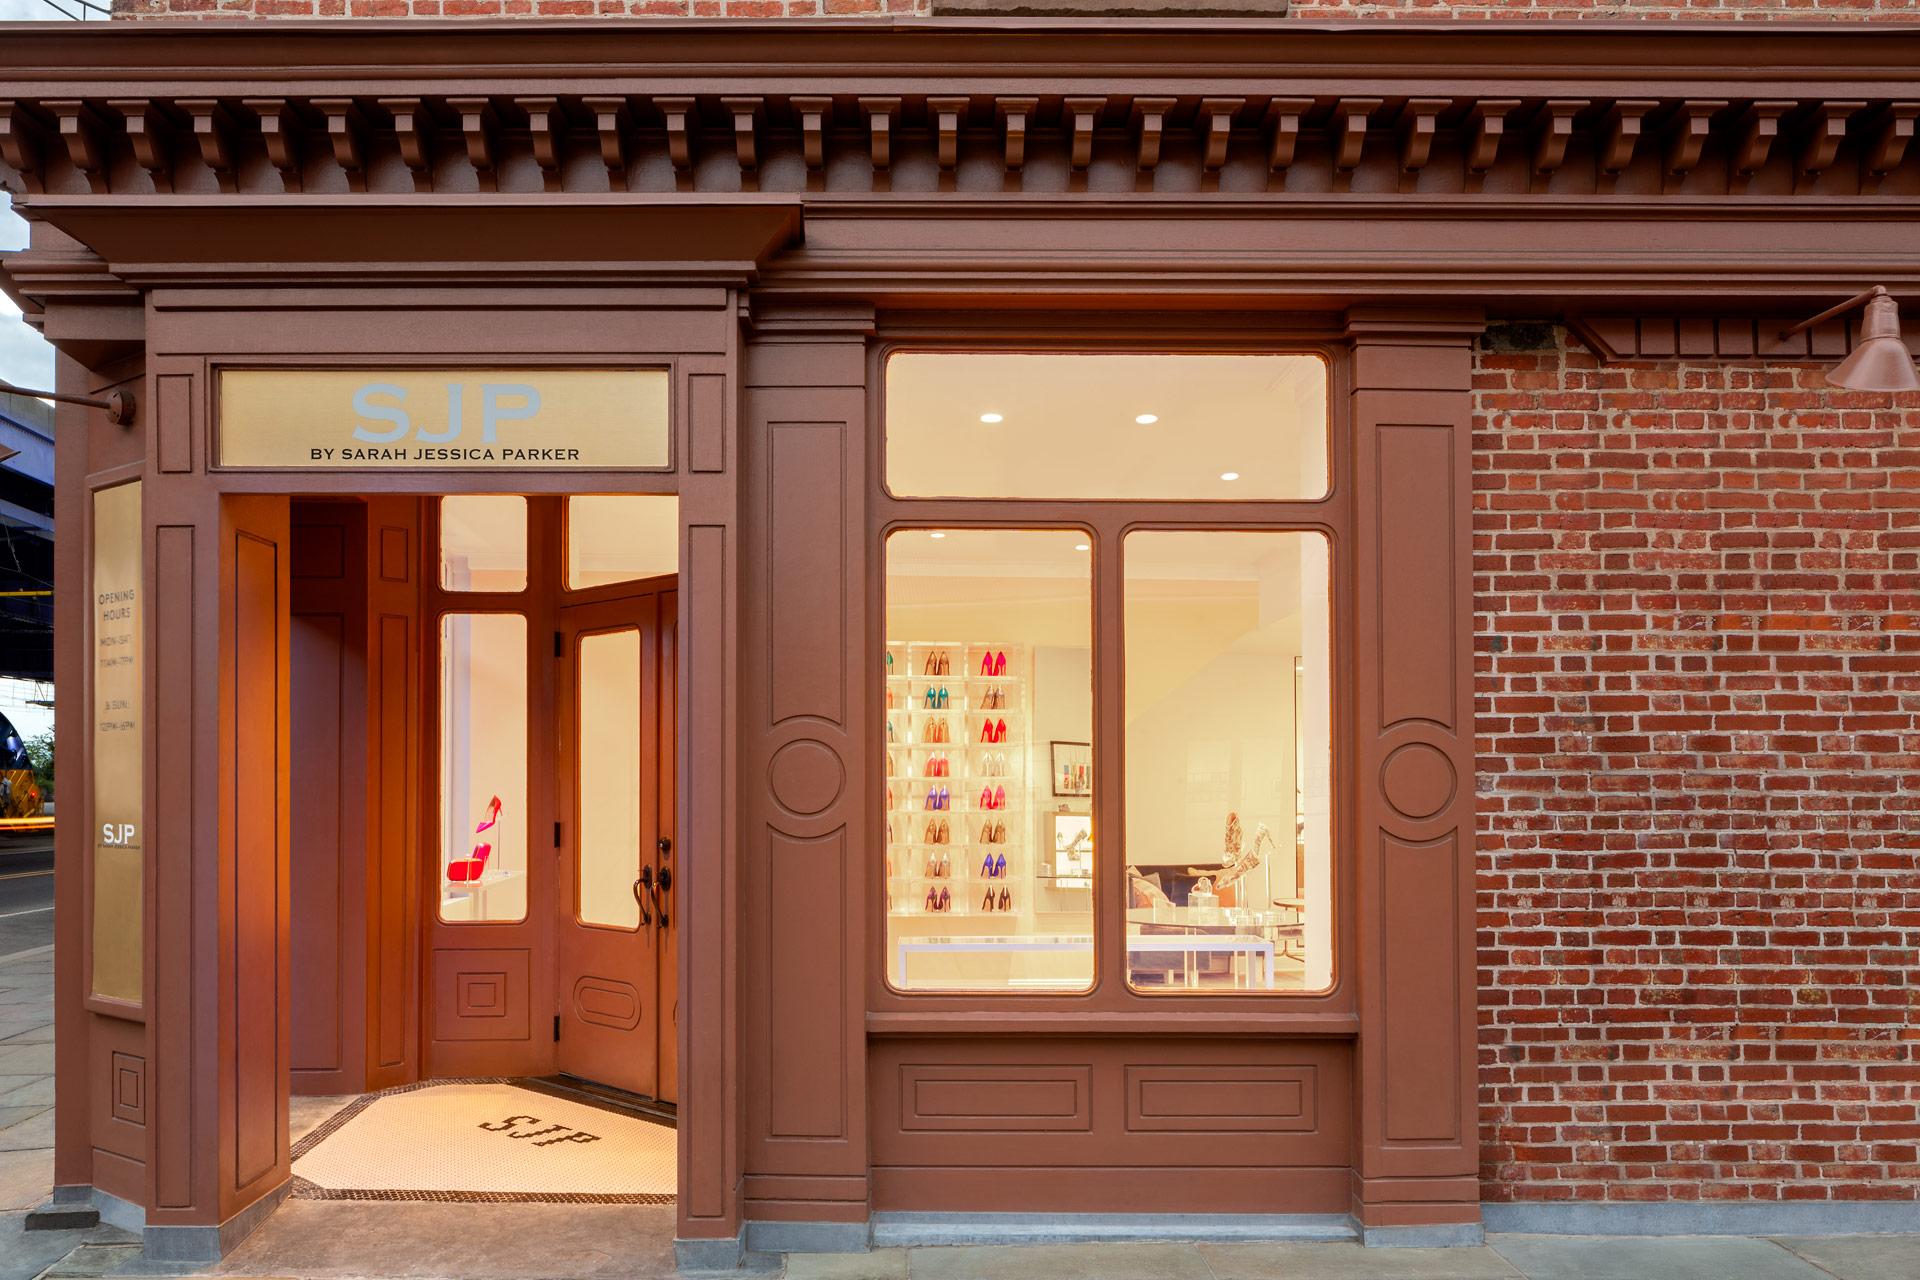 SJP by Sarah Jessica Parker retails store